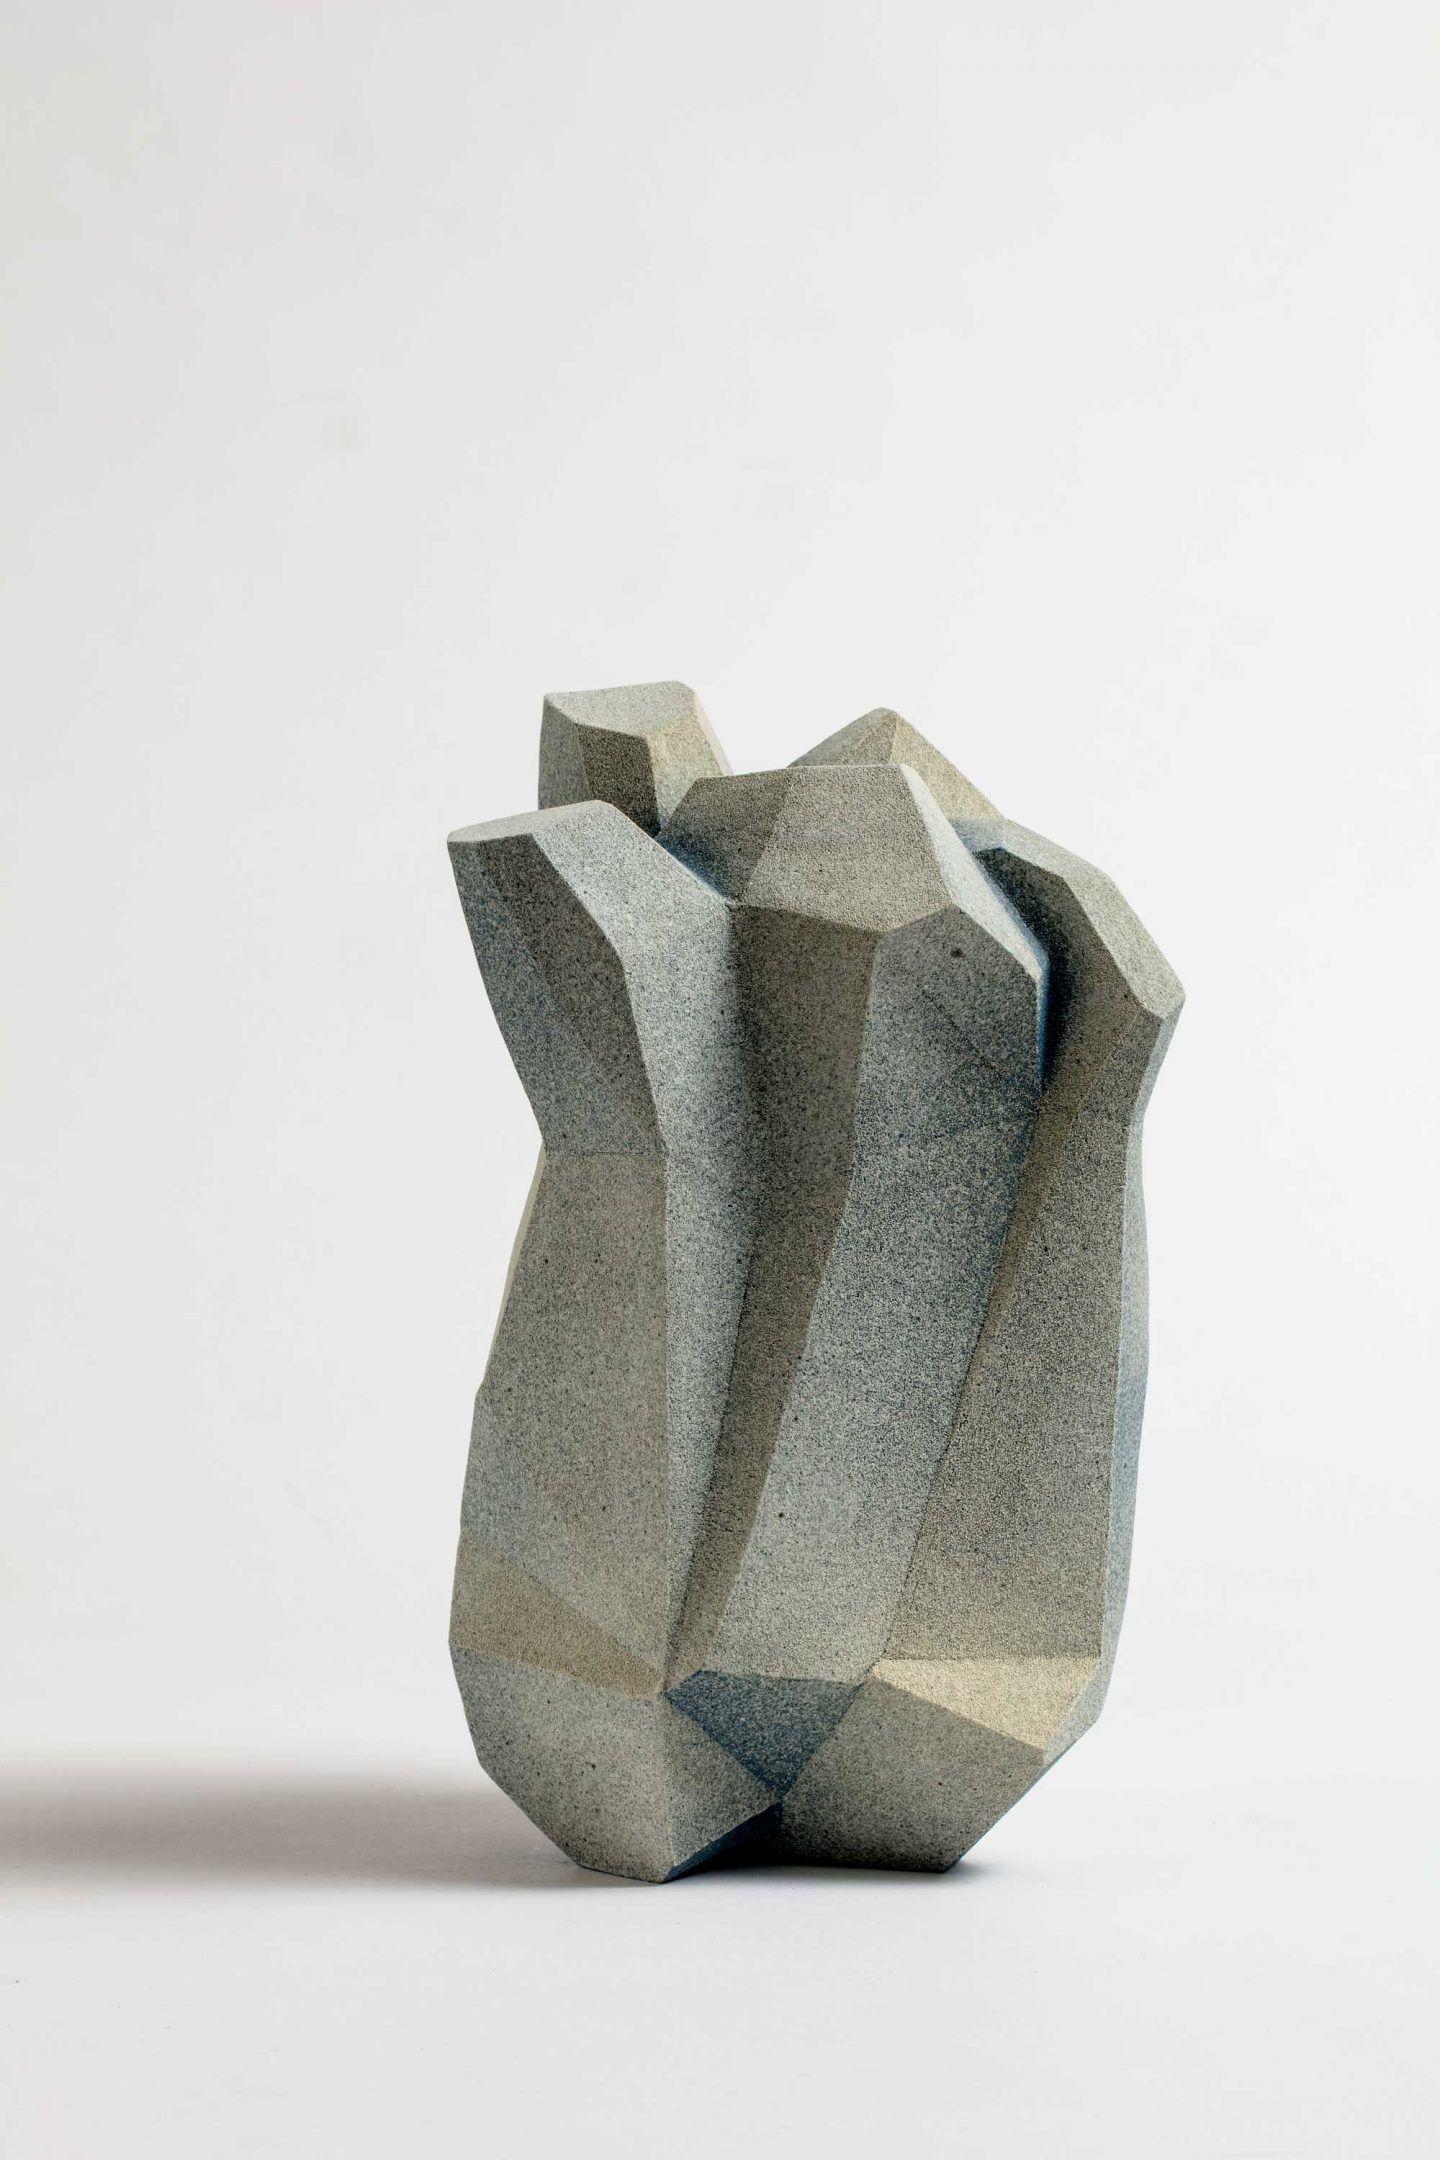 IGNANT-Design-Turi-Heisselberg-New-07